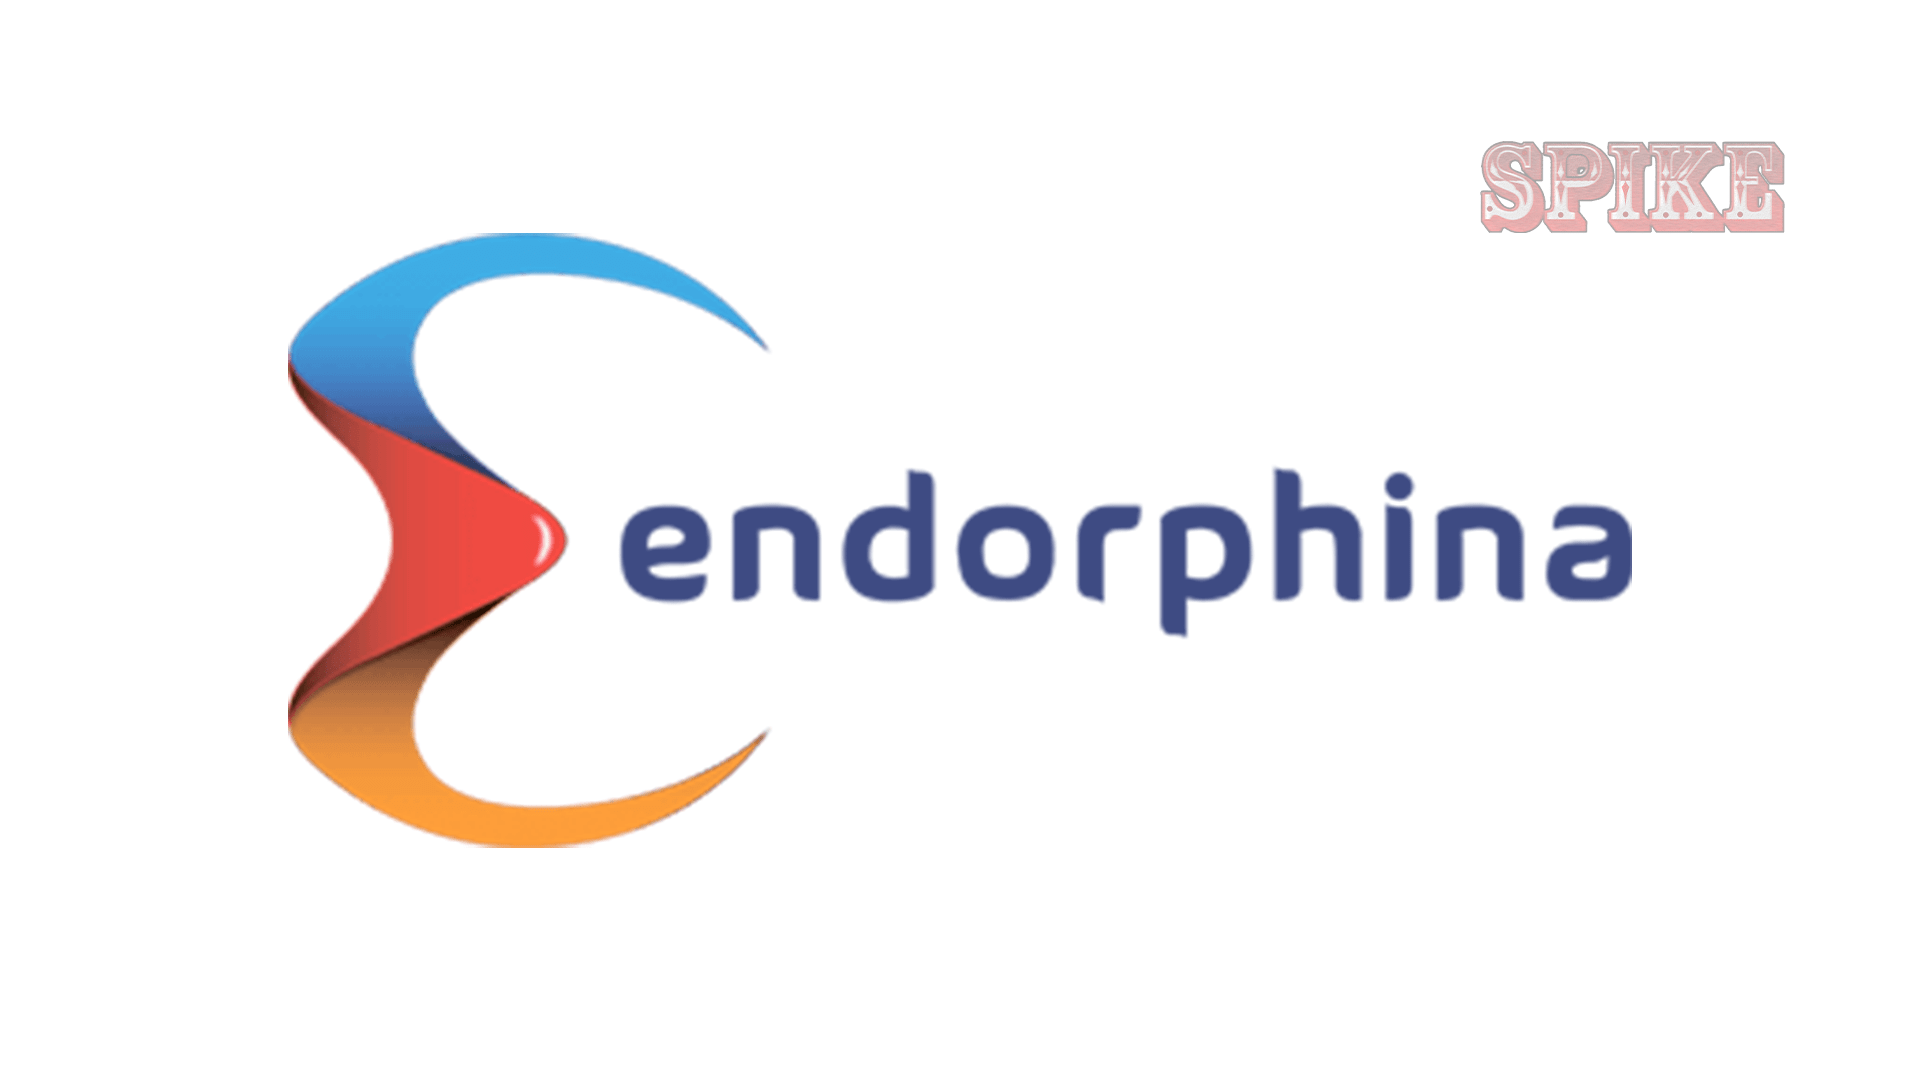 endorphina producer free demo slot online